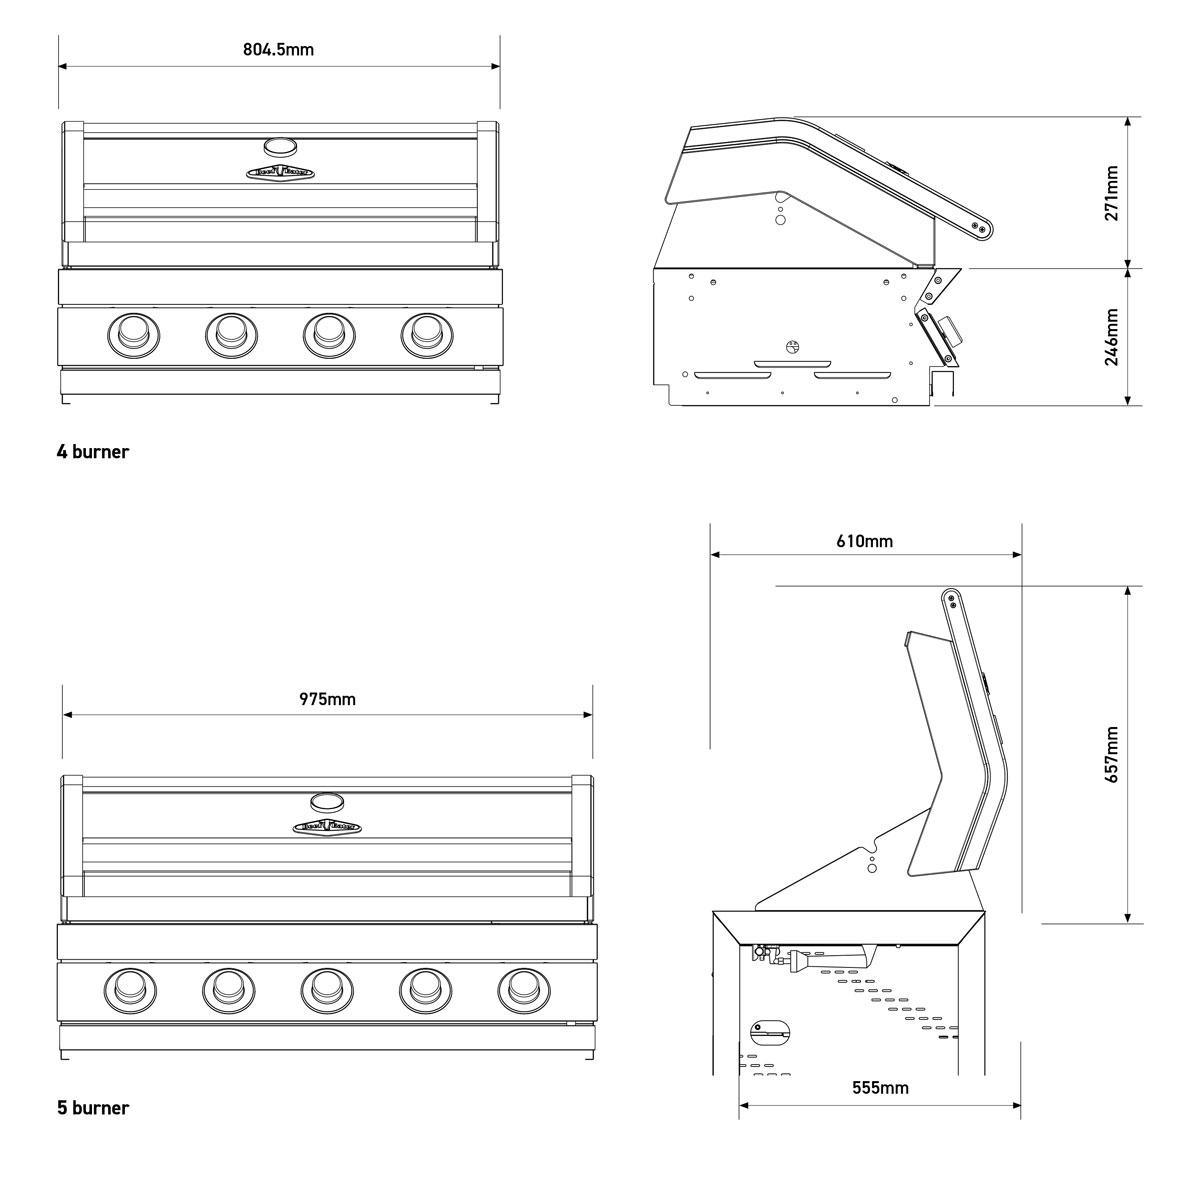 beefeater-1600-series-dark-4-burner-built-in-bbq-bbg1640d0a-size.jpg